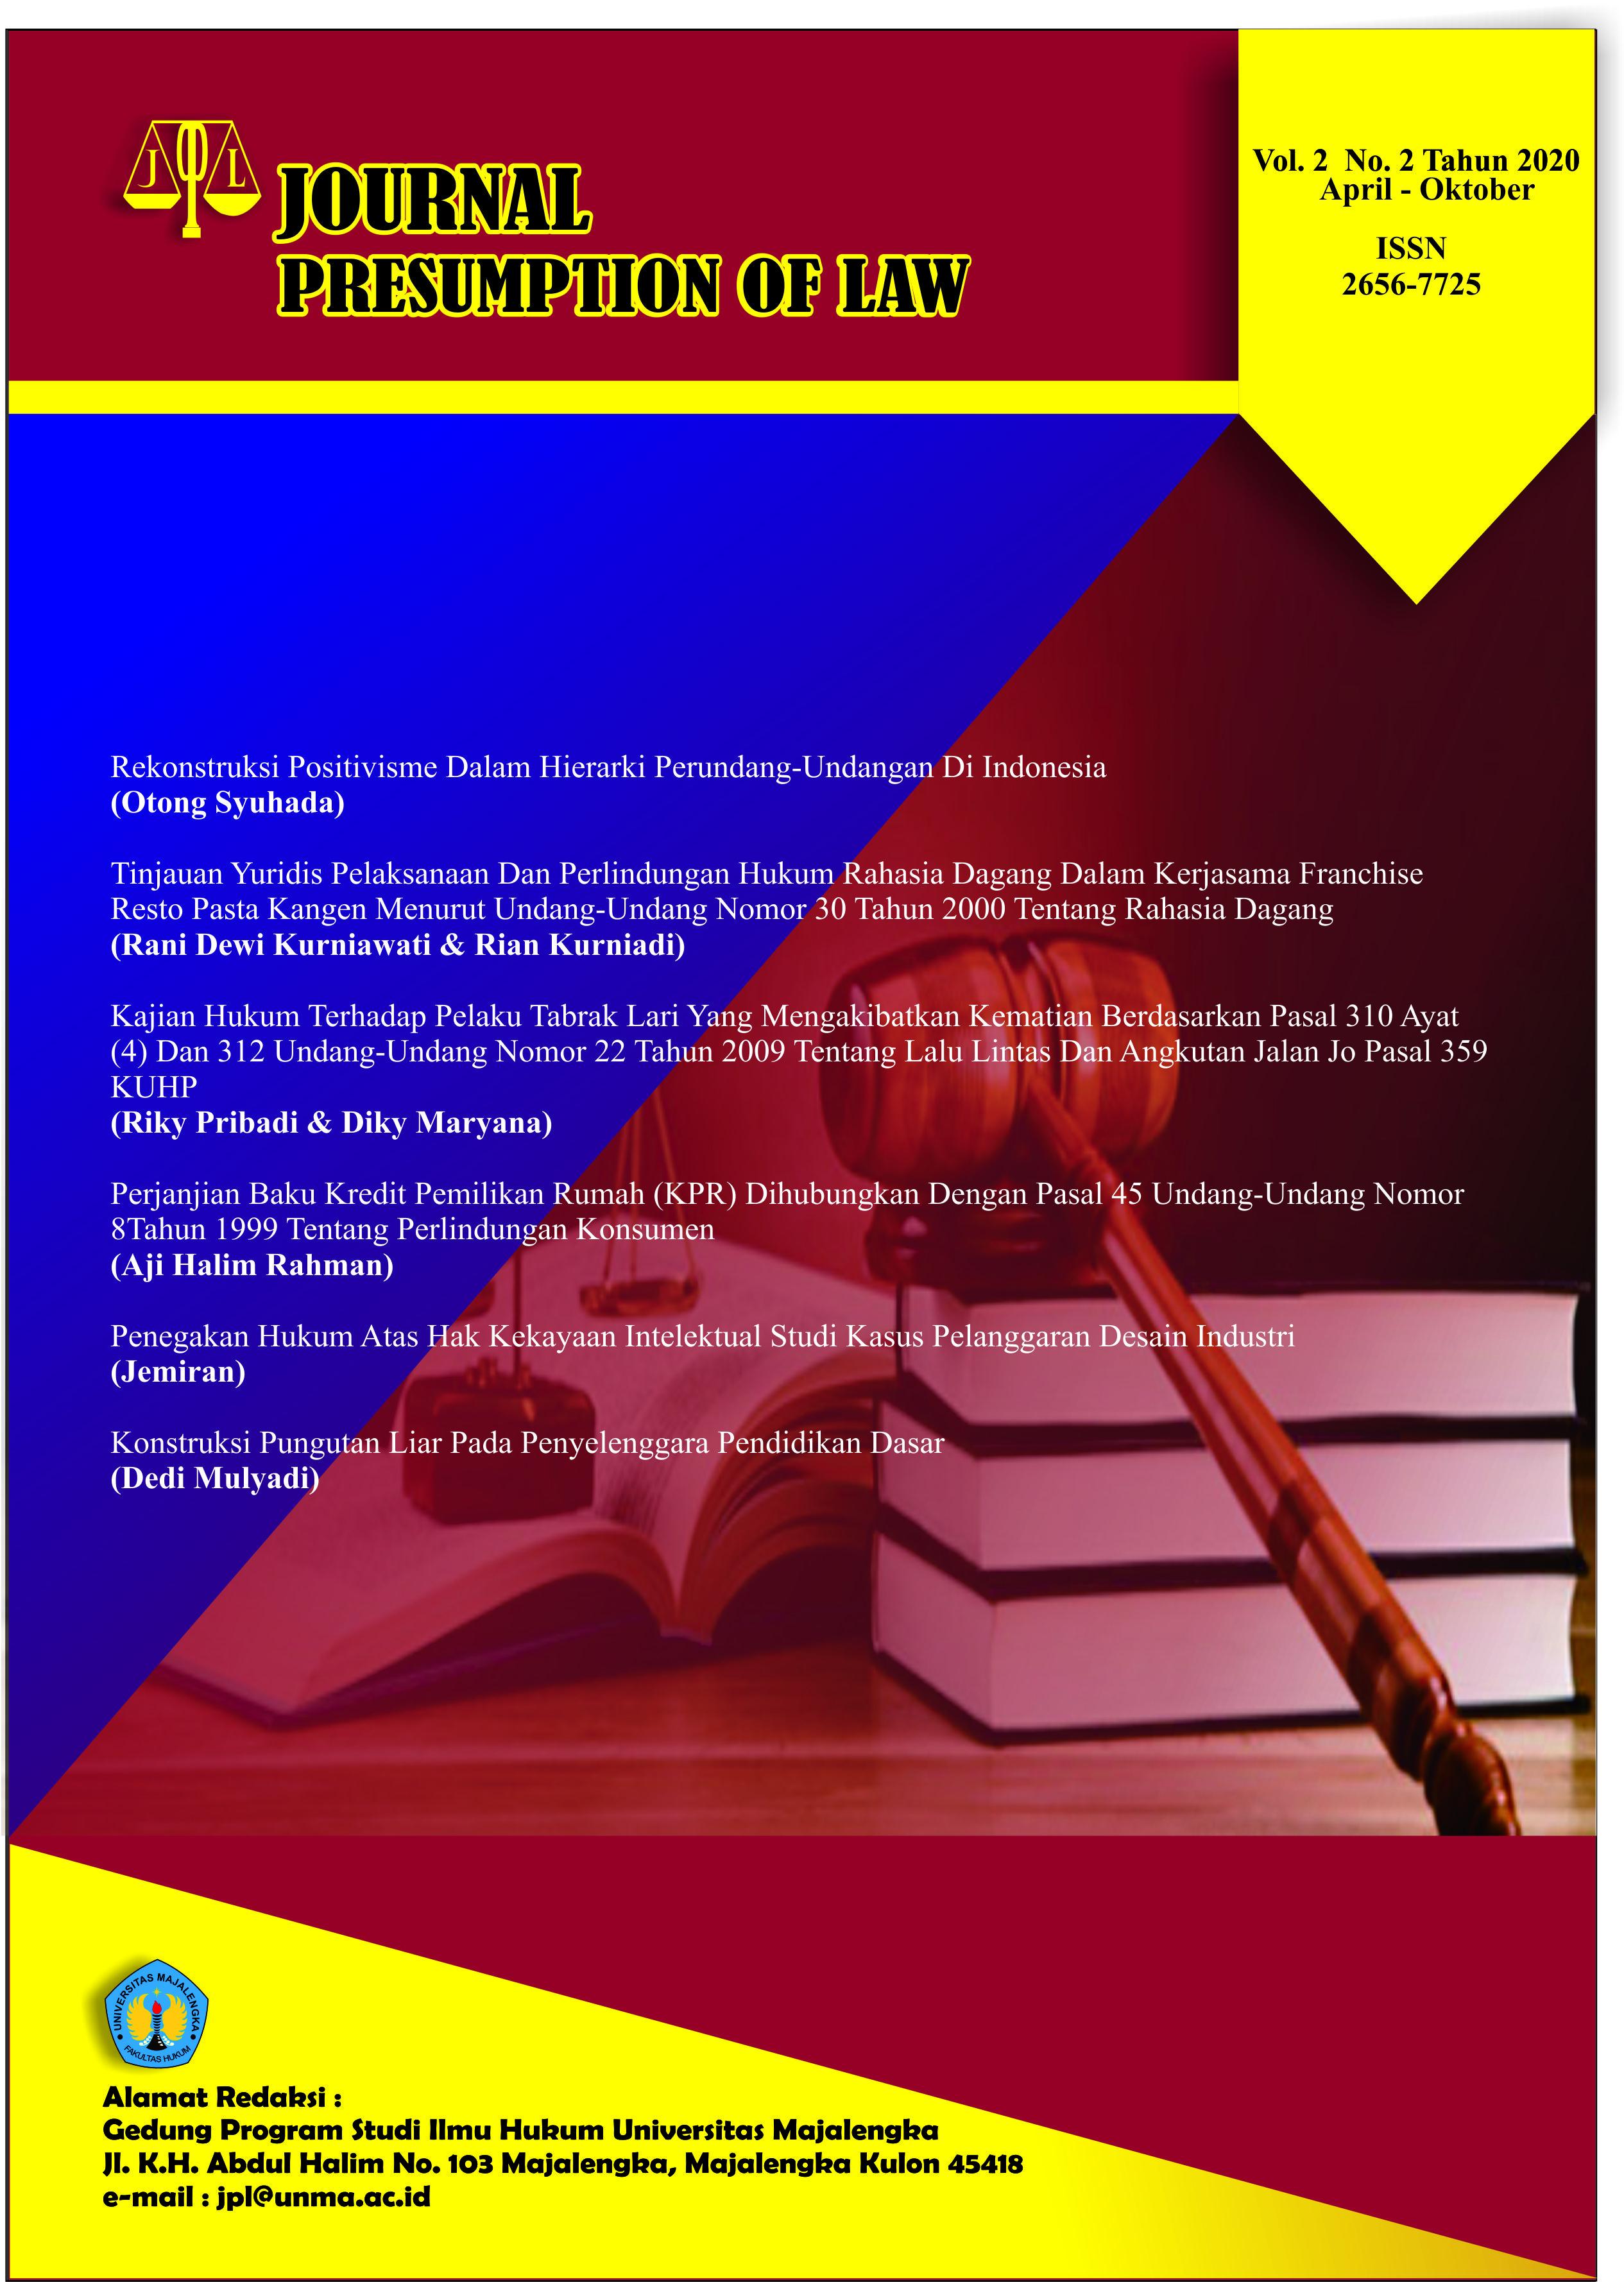 Vol 2 No 2 (2020): Volume 2 Nomor 2 Tahun 2020   Journal Presumption of Law